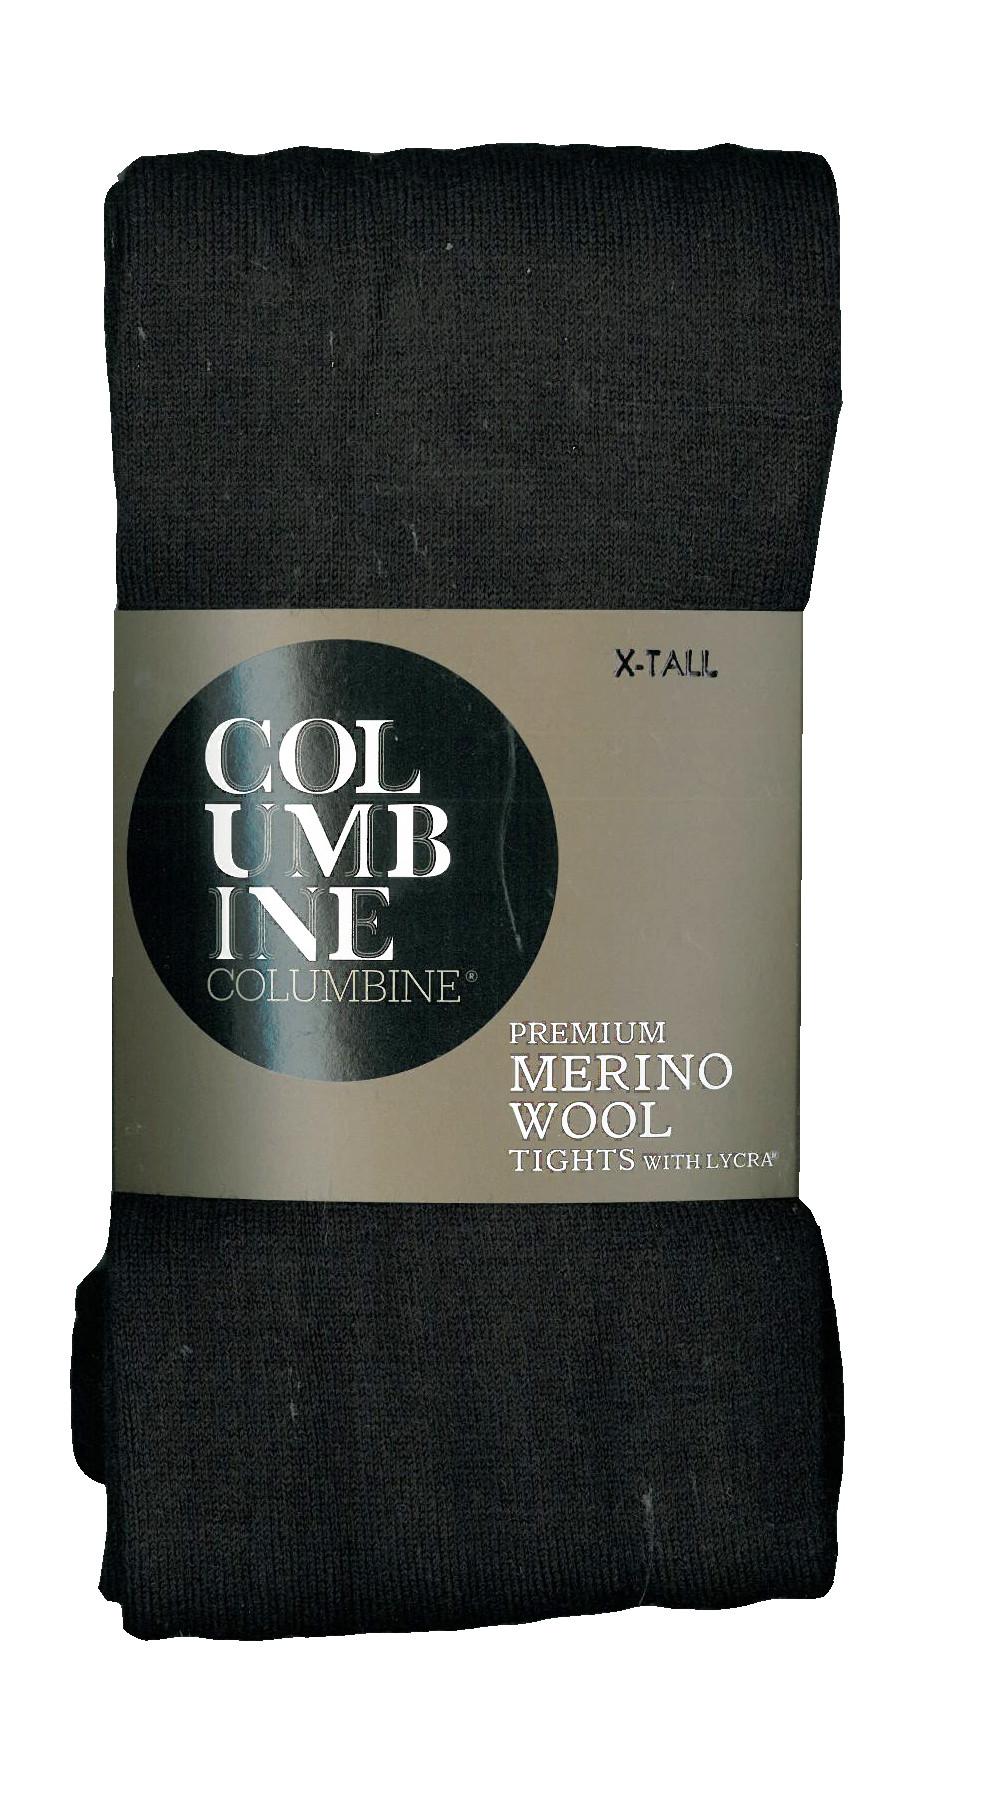 Columbine NZ Merino Wool Tights Women/'s Clothing